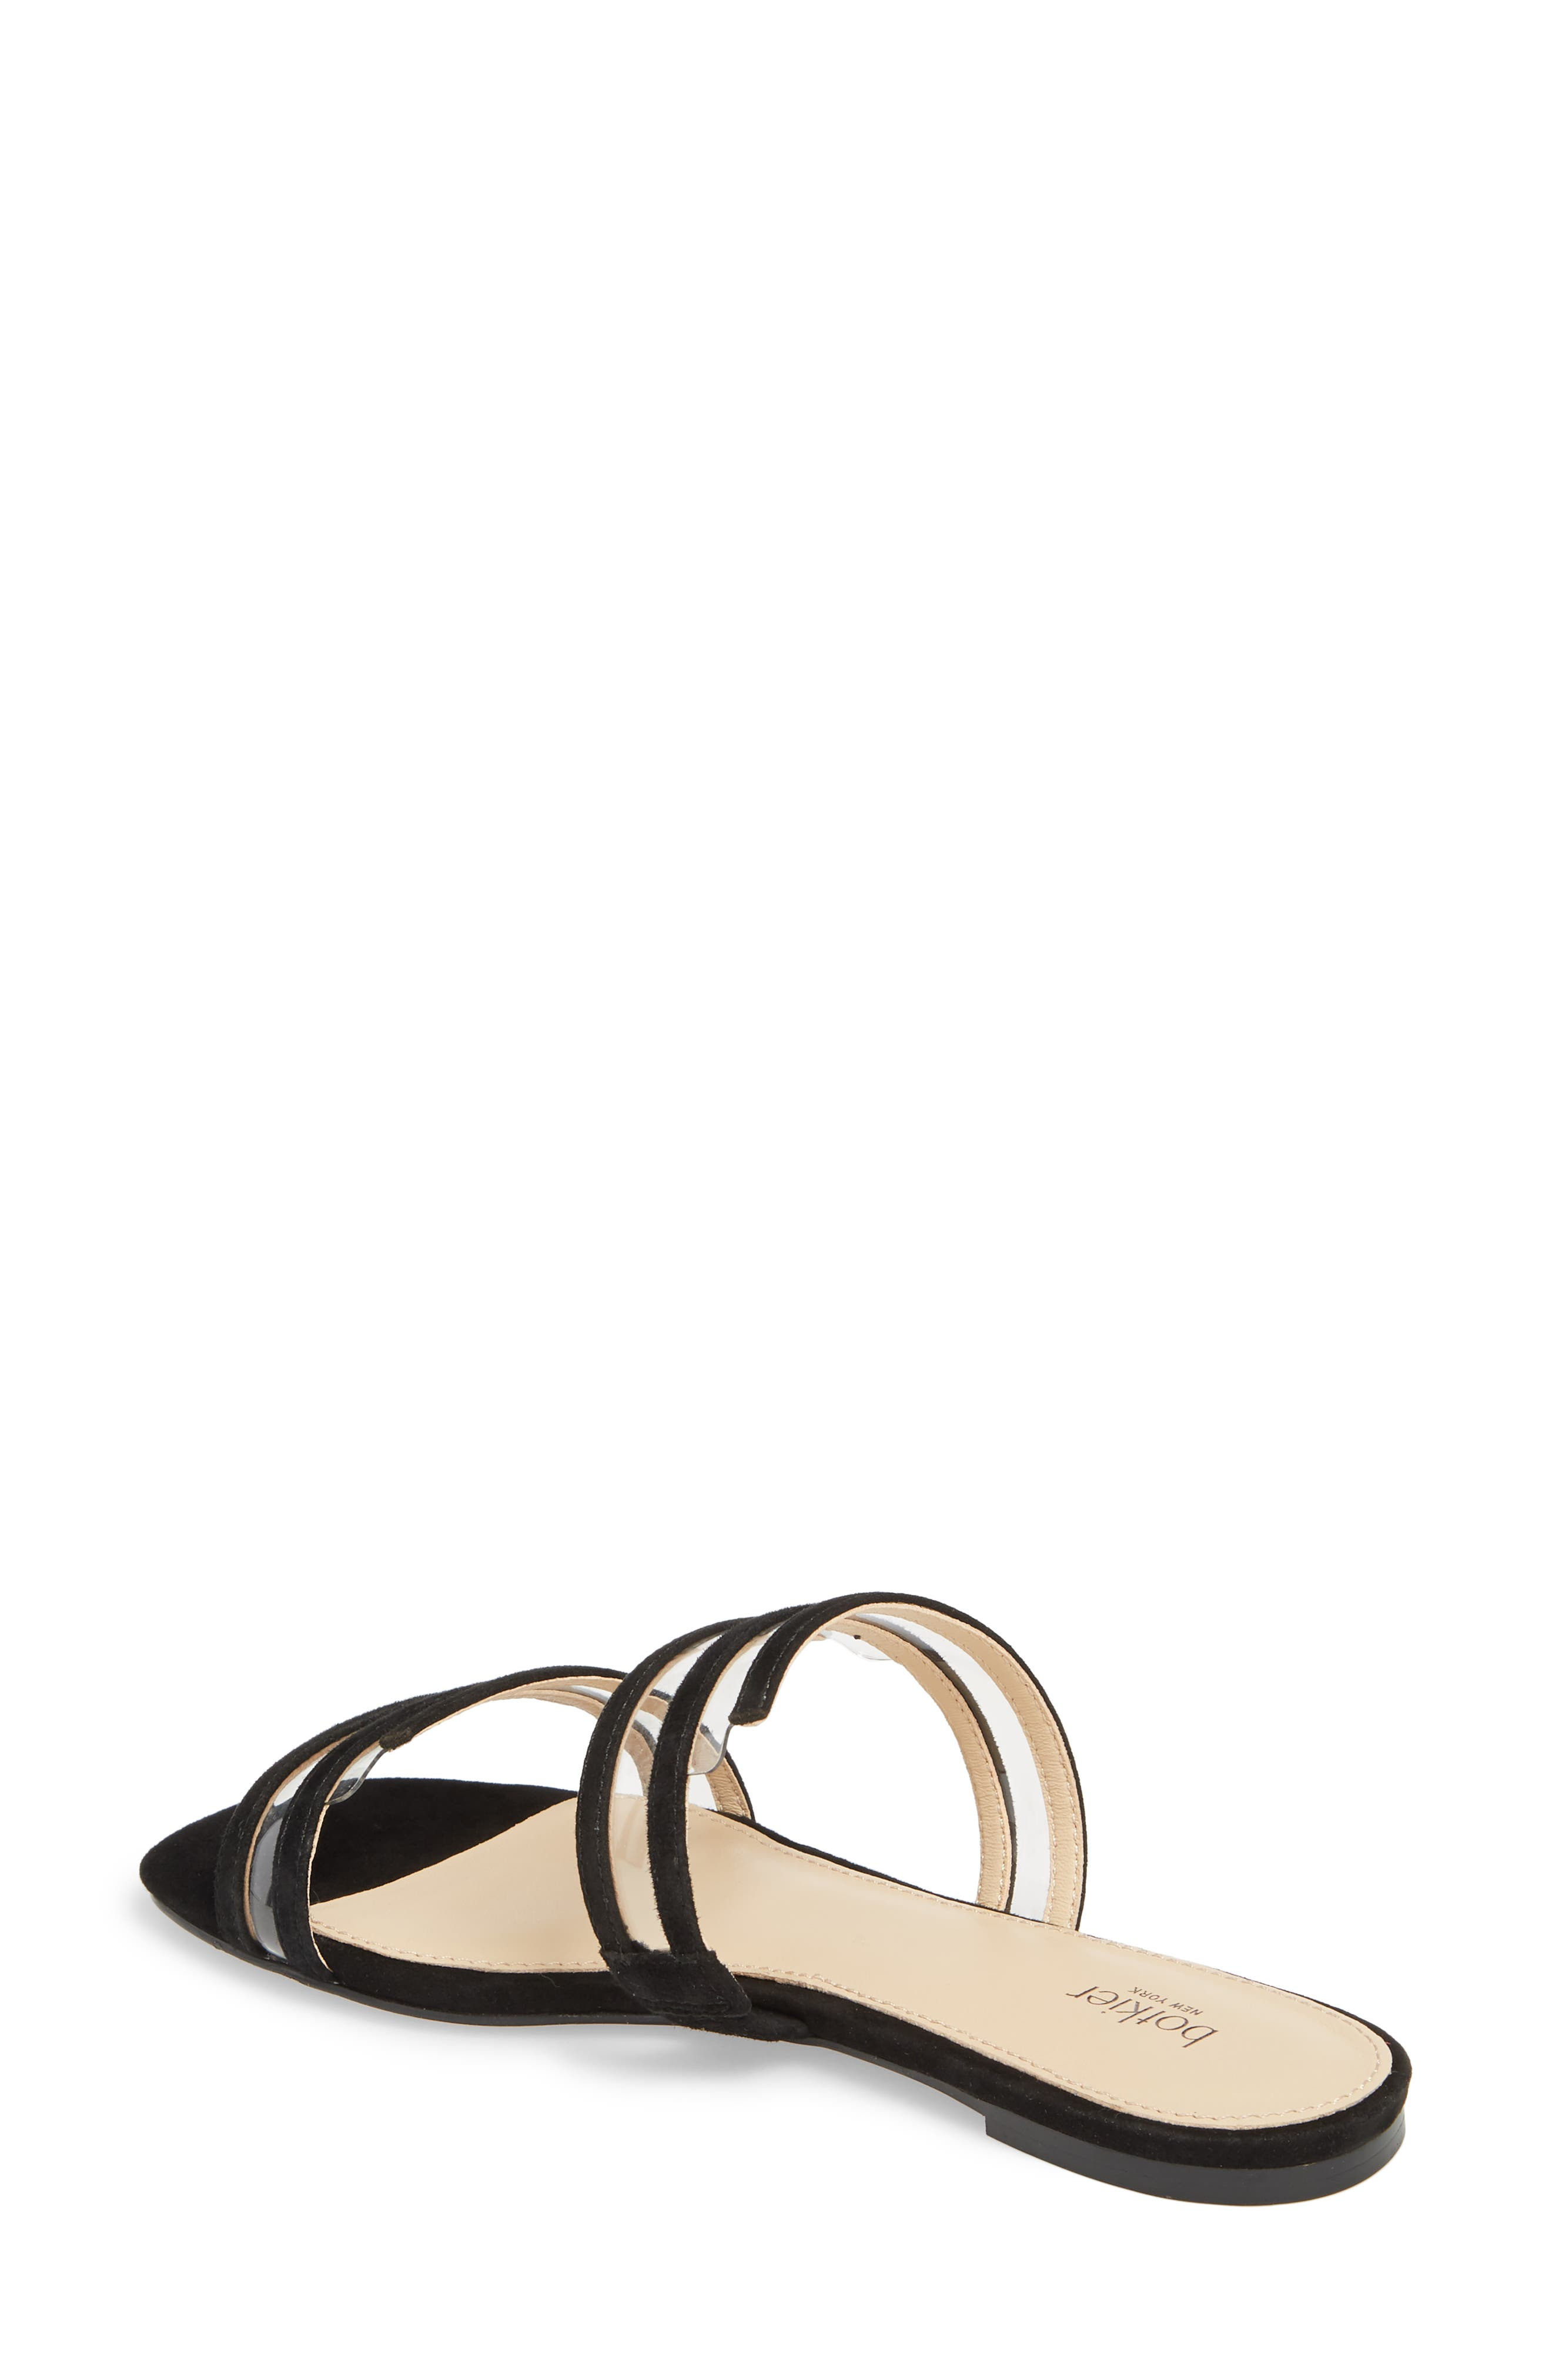 Maise Slide Sandal,                             Alternate thumbnail 2, color,                             BLACK SUEDE